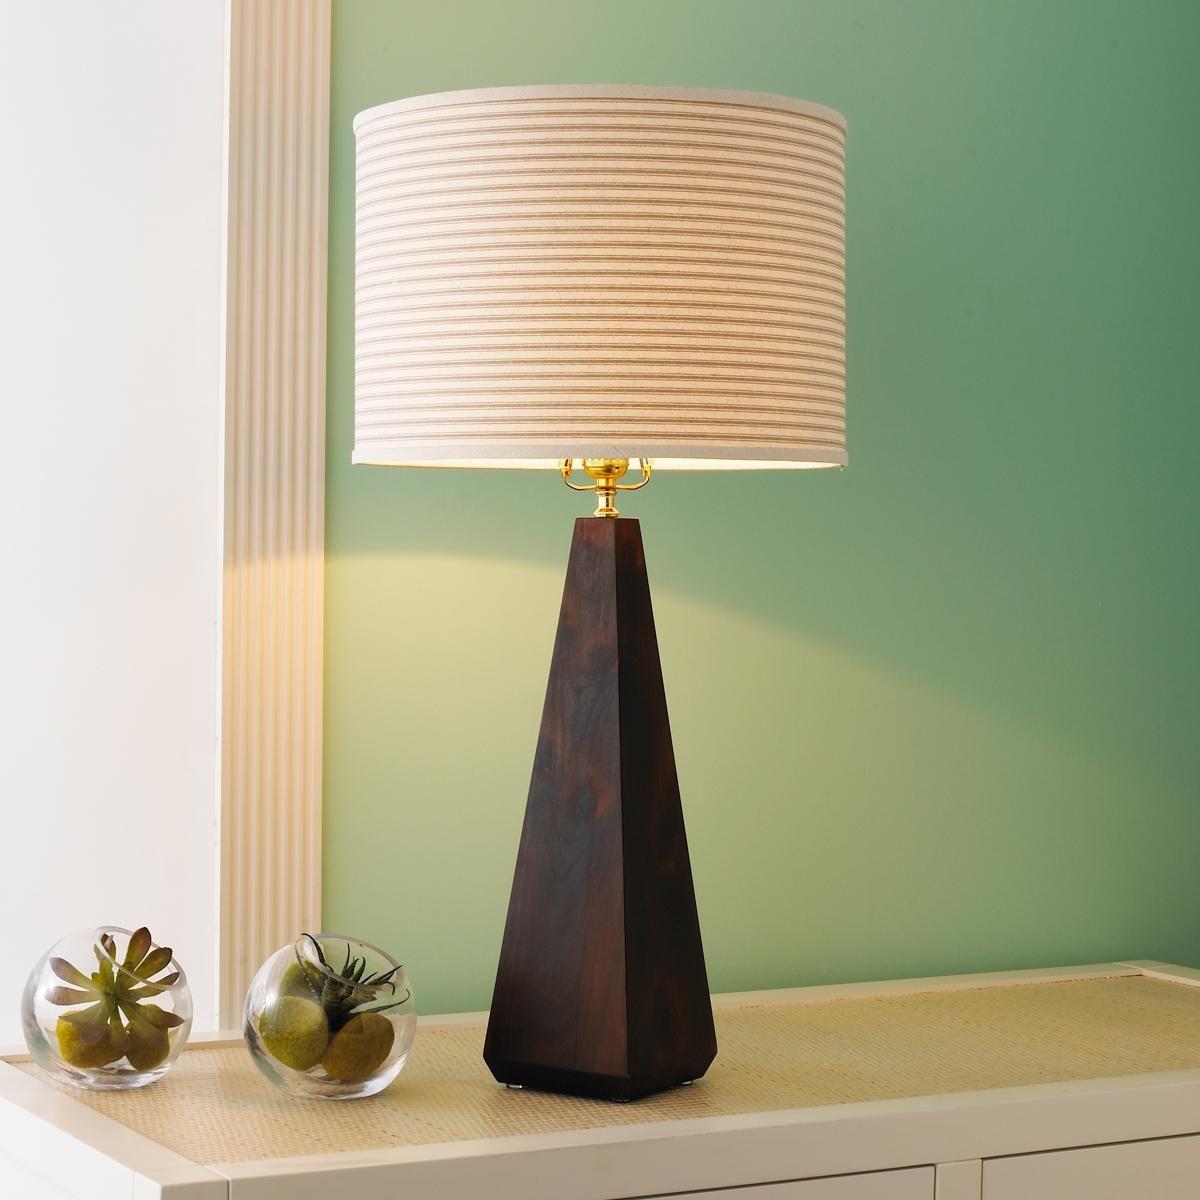 Artisan Wood Square Pyramid Lamp Base, Different Shade... An Option, $200